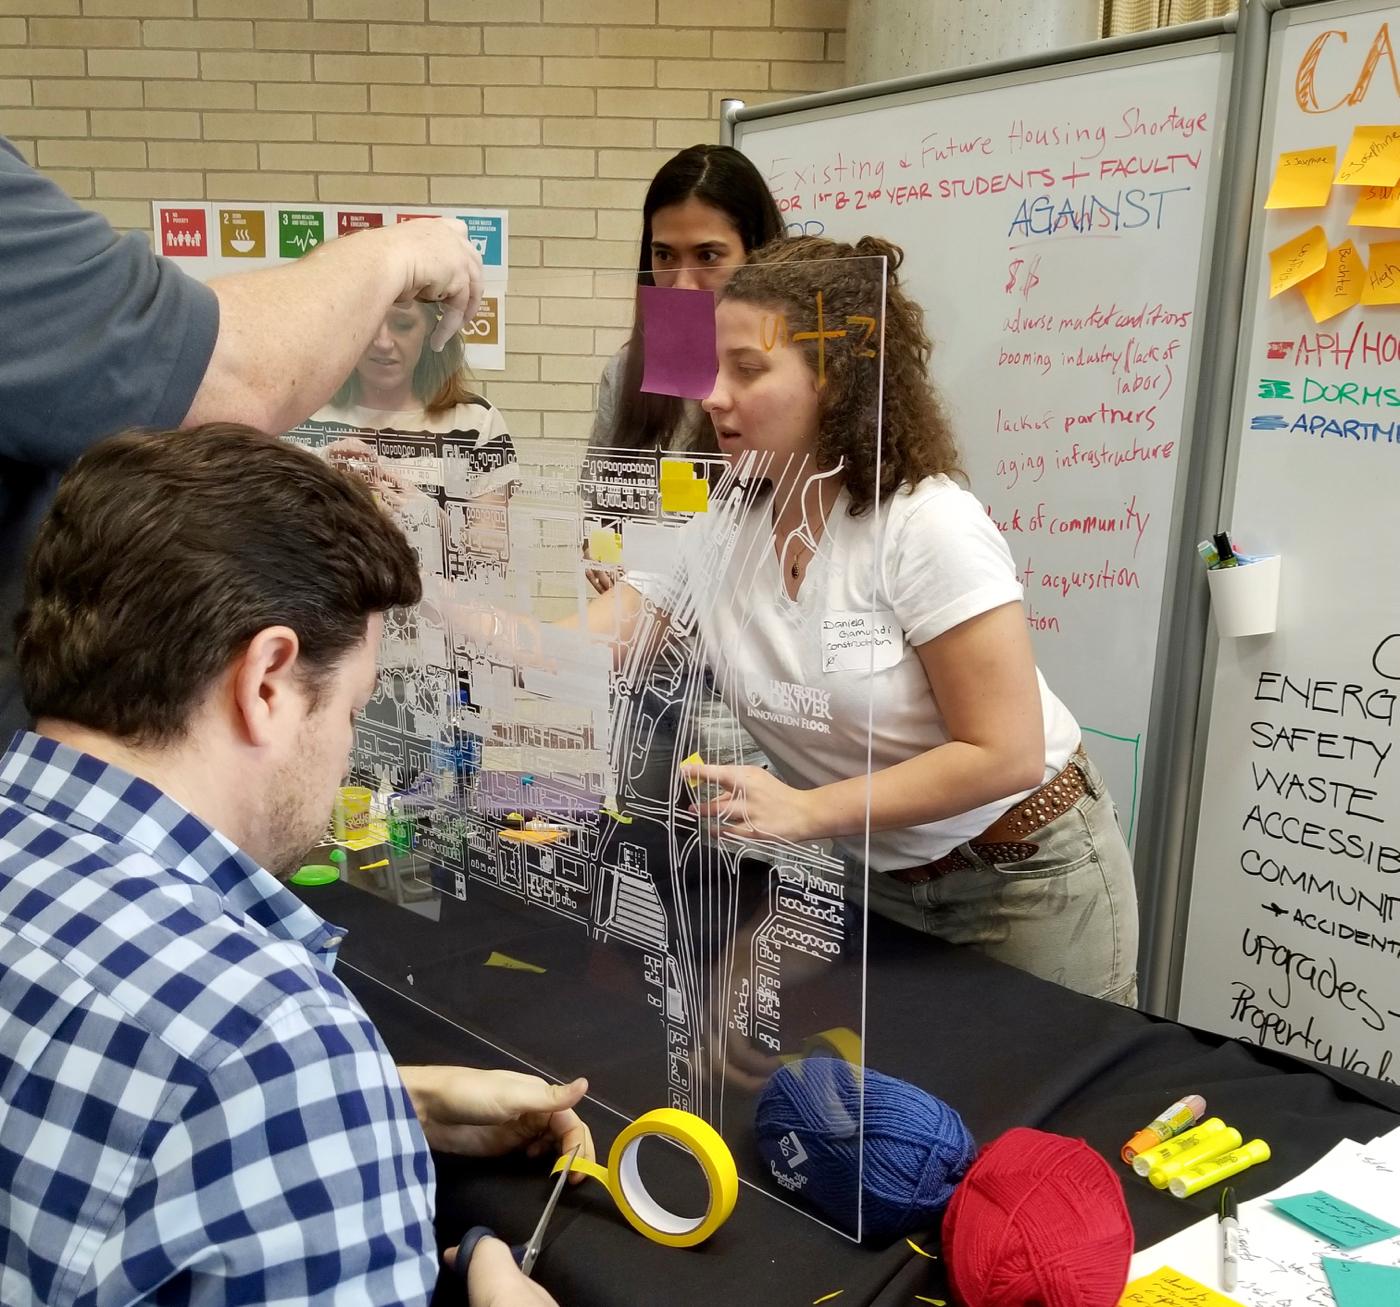 University of Denver Students Designing the Future